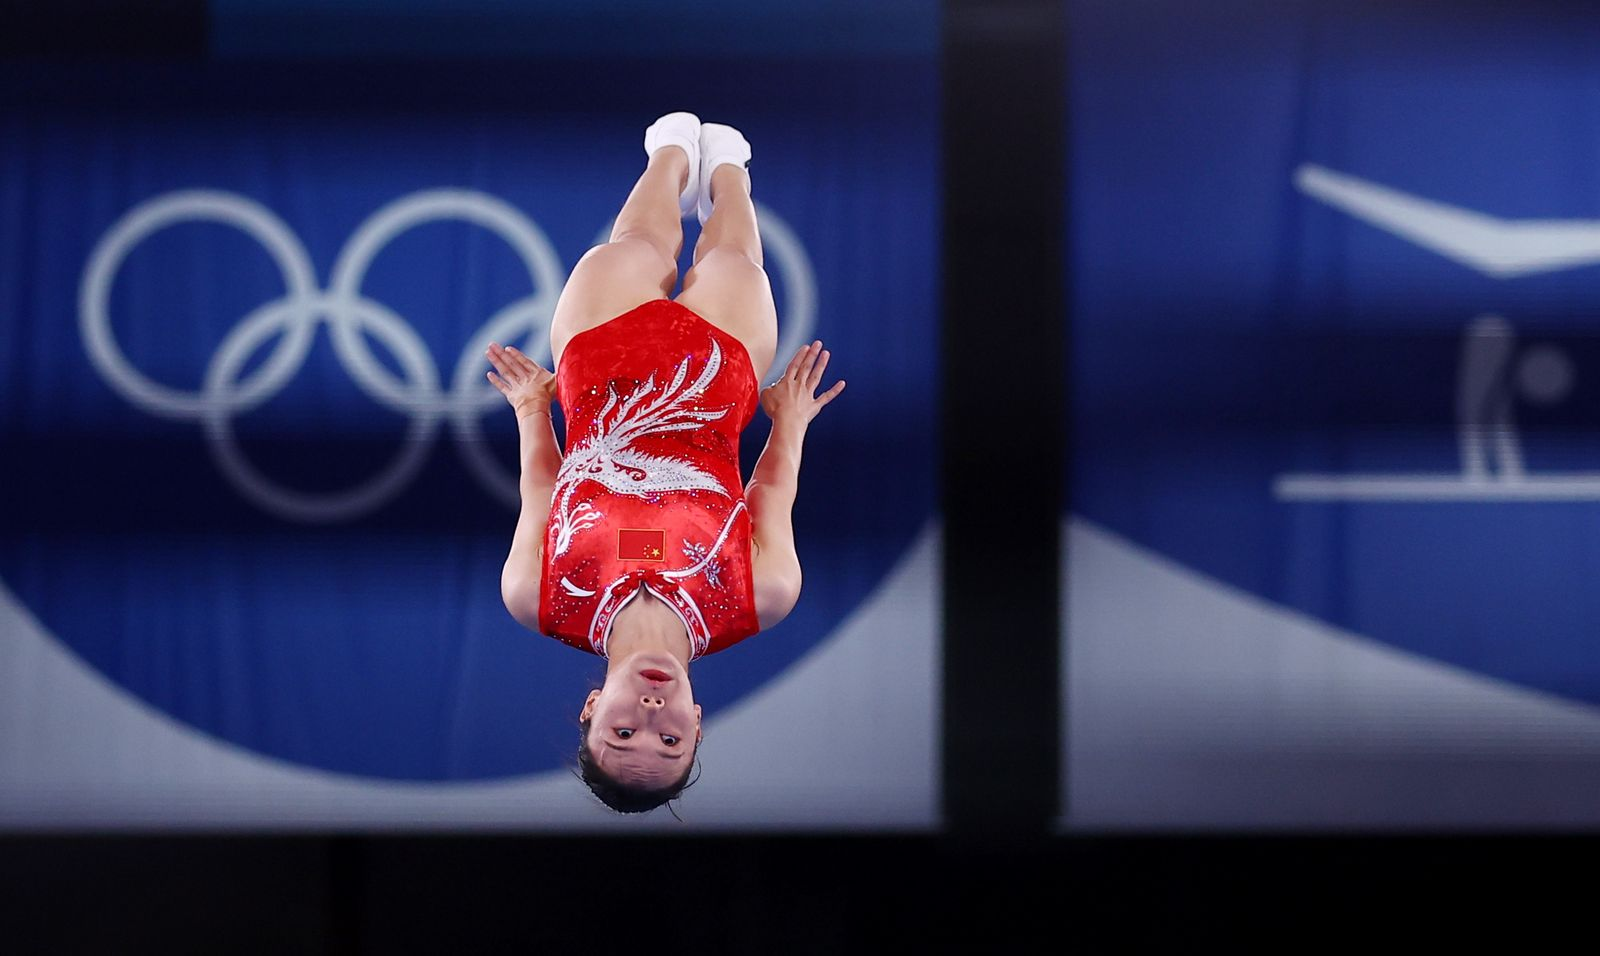 Gymnastics - Trampolining - Women's Individual Trampoline - Qualification